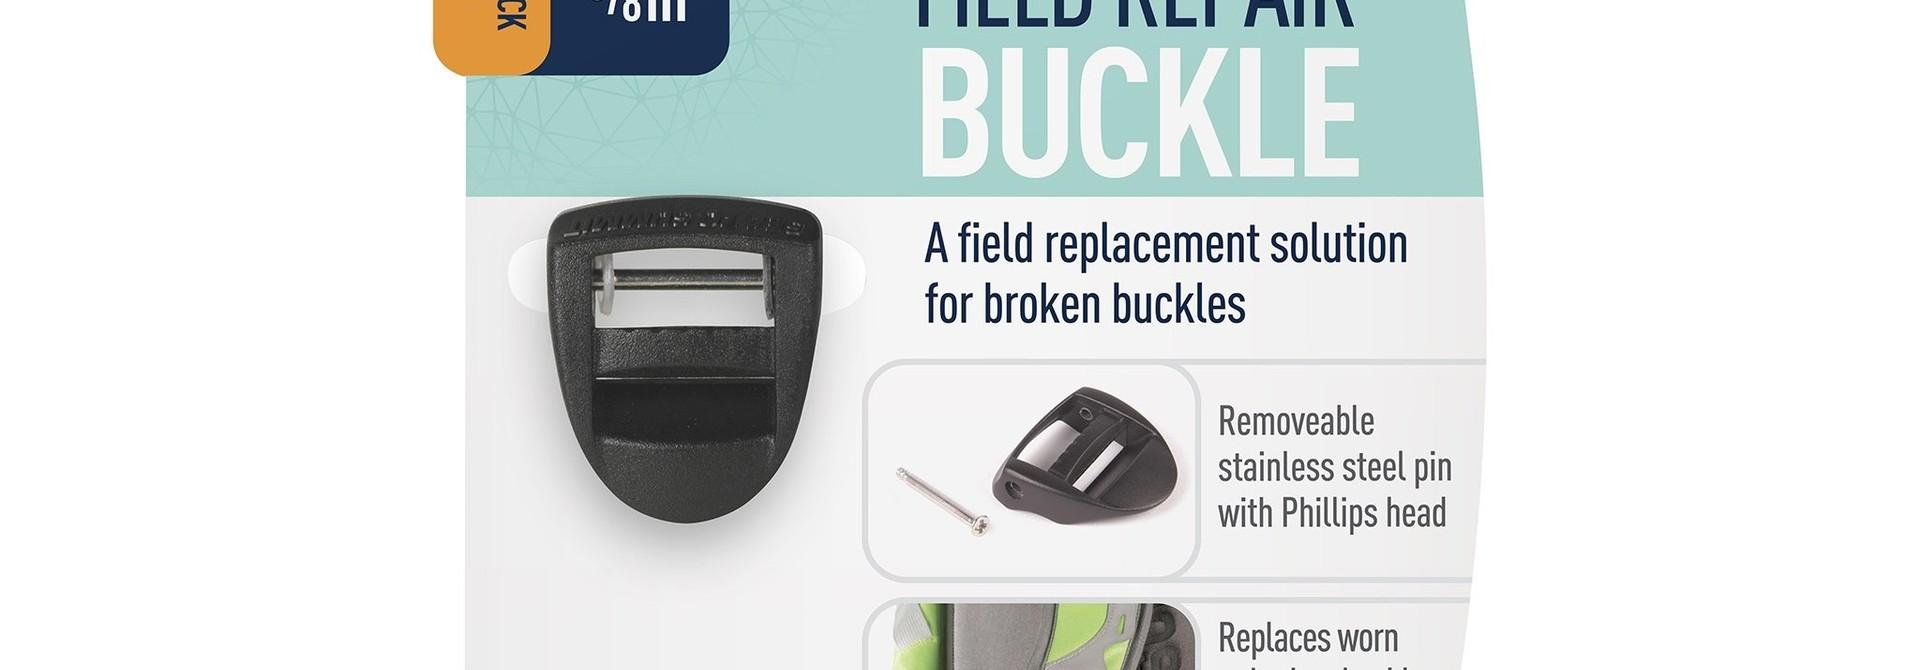 "Field Repair Buckle 15mm / 5/8"" Ladderlock 1 Pin"